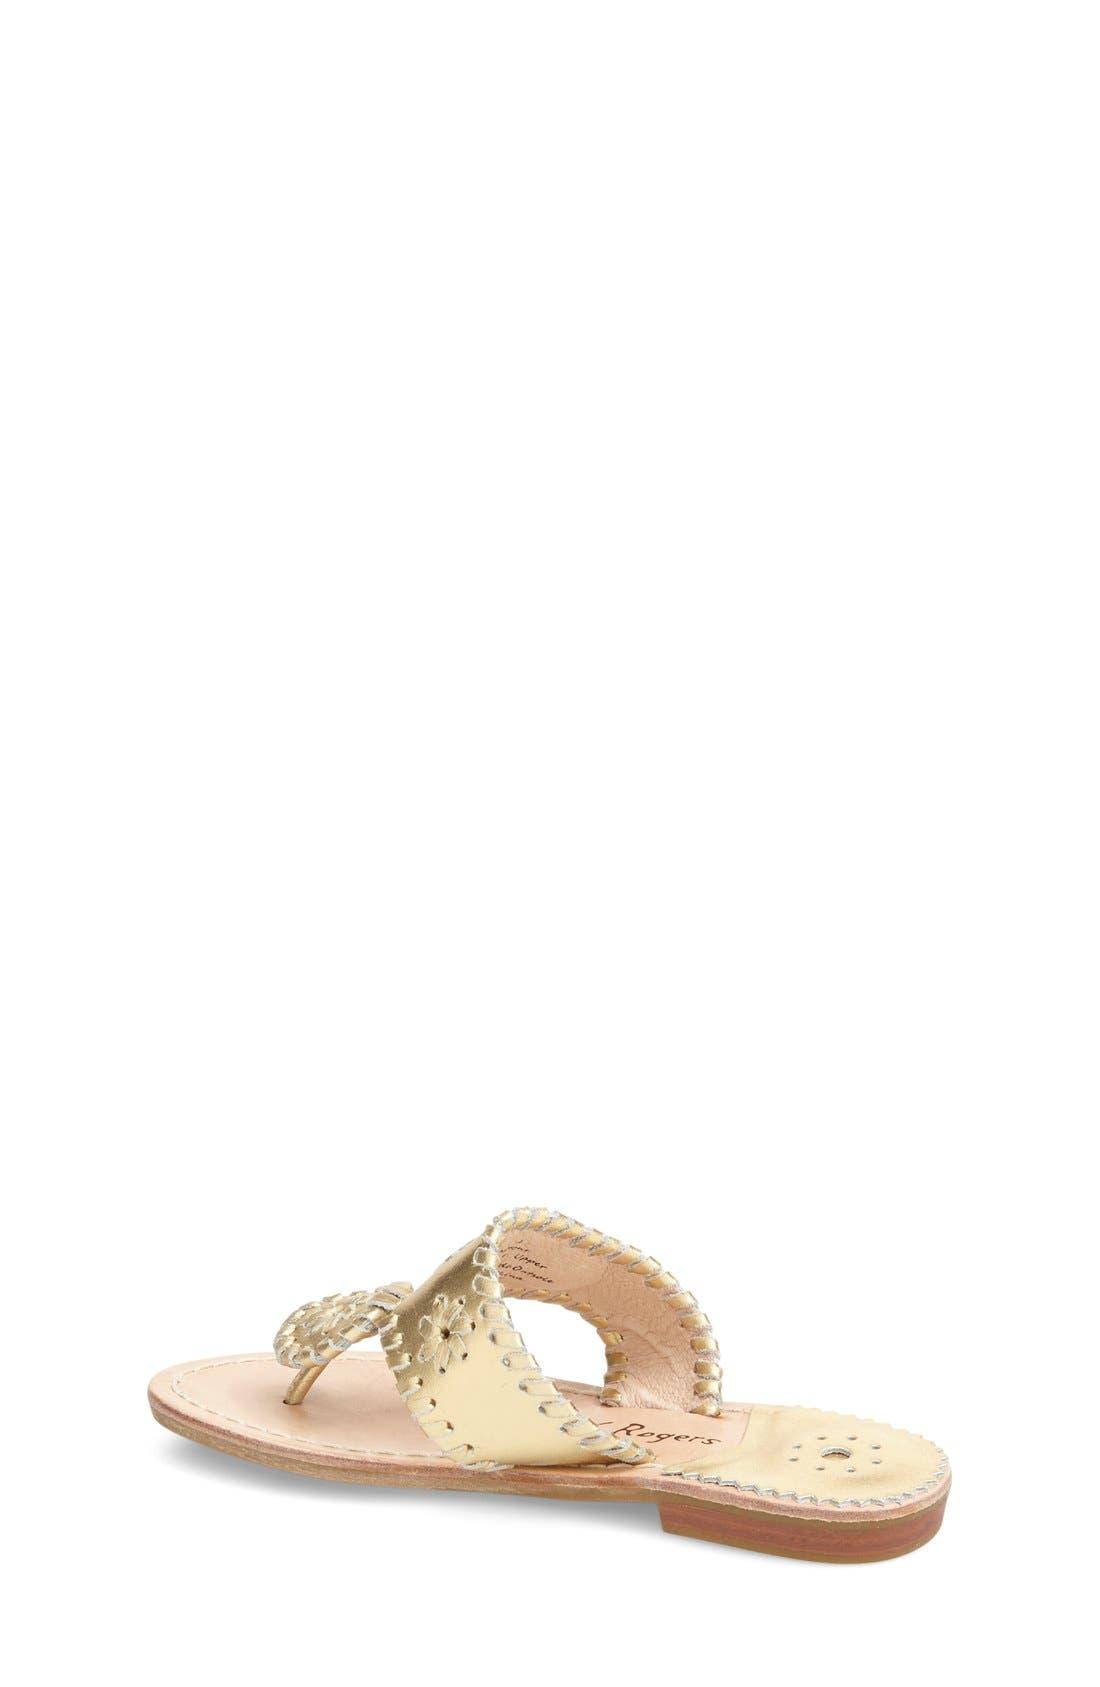 'Miss Hamptons' Sandal,                             Alternate thumbnail 2, color,                             GOLD